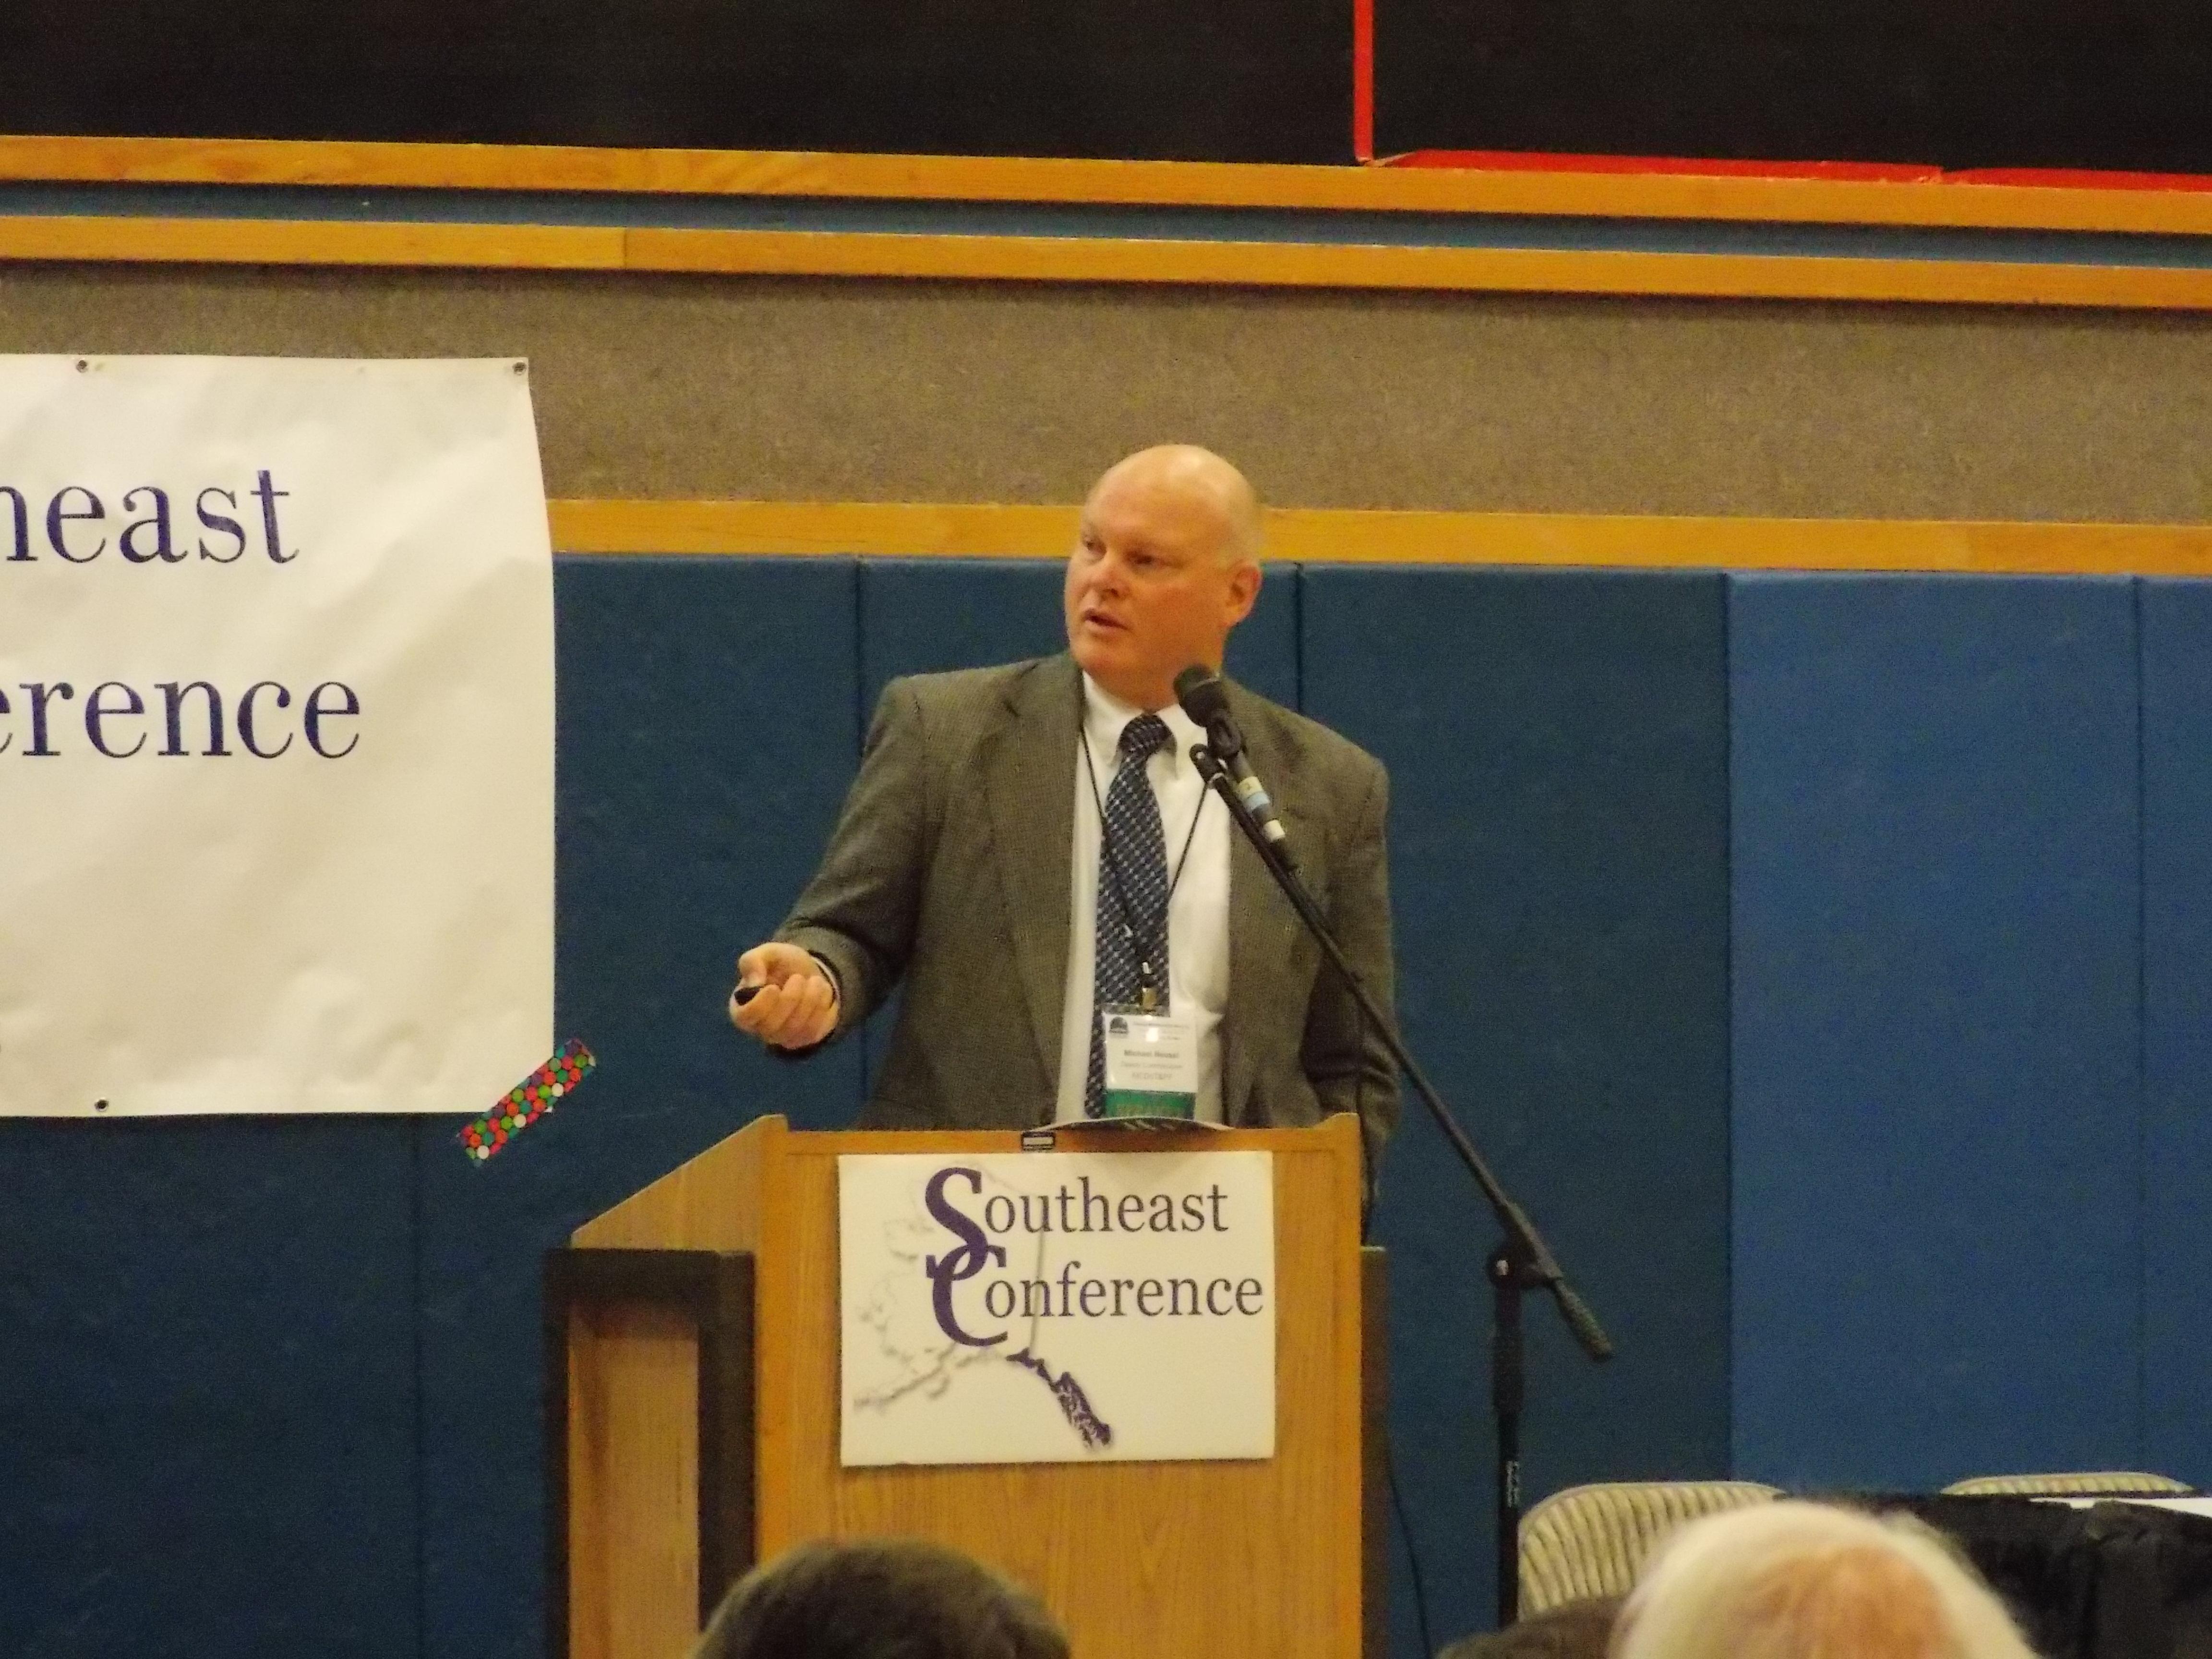 Alaska Department of Transportation deputy commissioner Mike Neussl addresses the Southeast Conference annual meeting September 21, 2016.